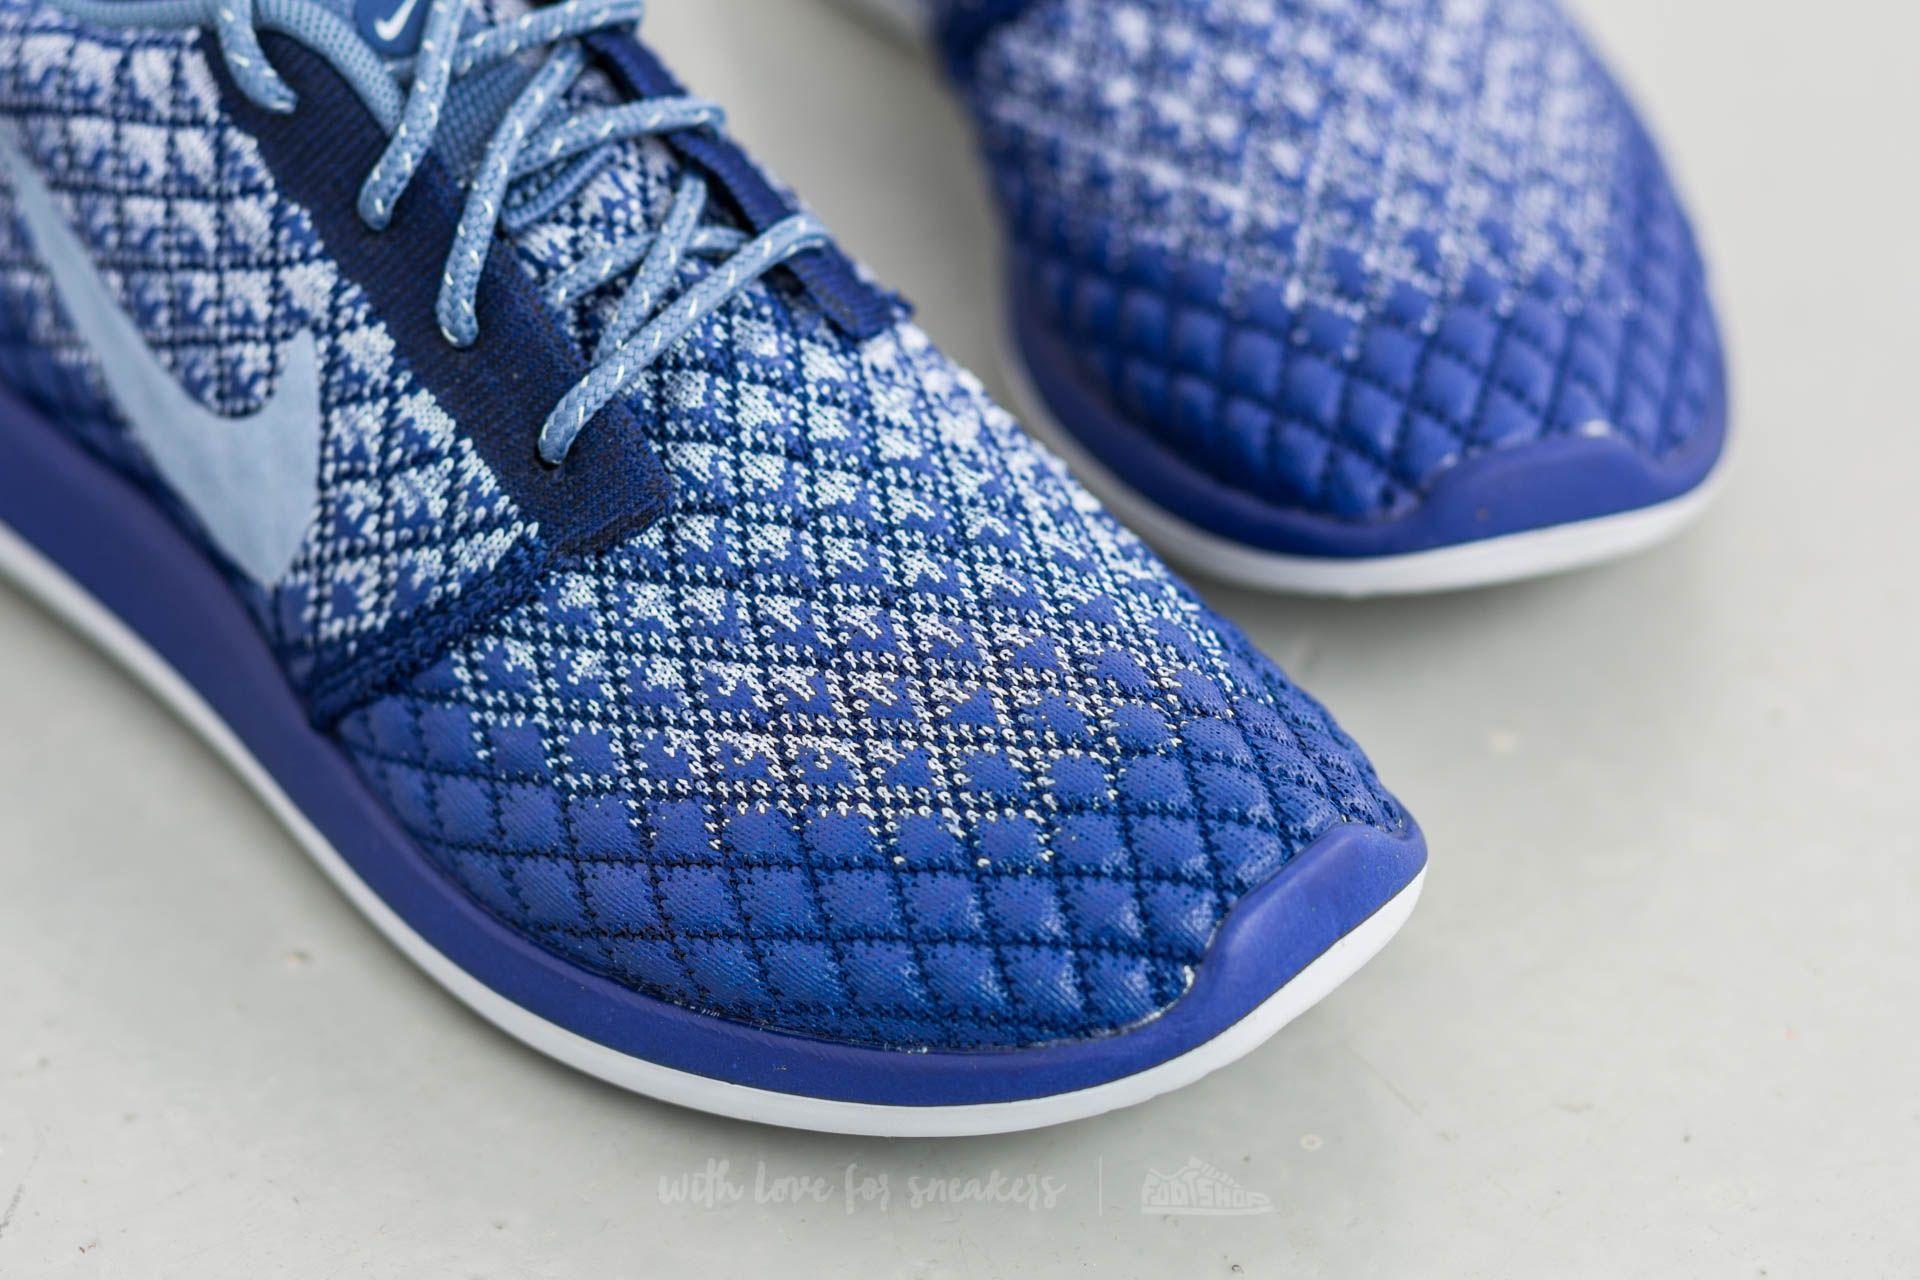 hot sale online 14fa1 b4cb0 Nike W Roshe Two Flyknit 365 Deep Royal Blue/ Ocean Fog ...